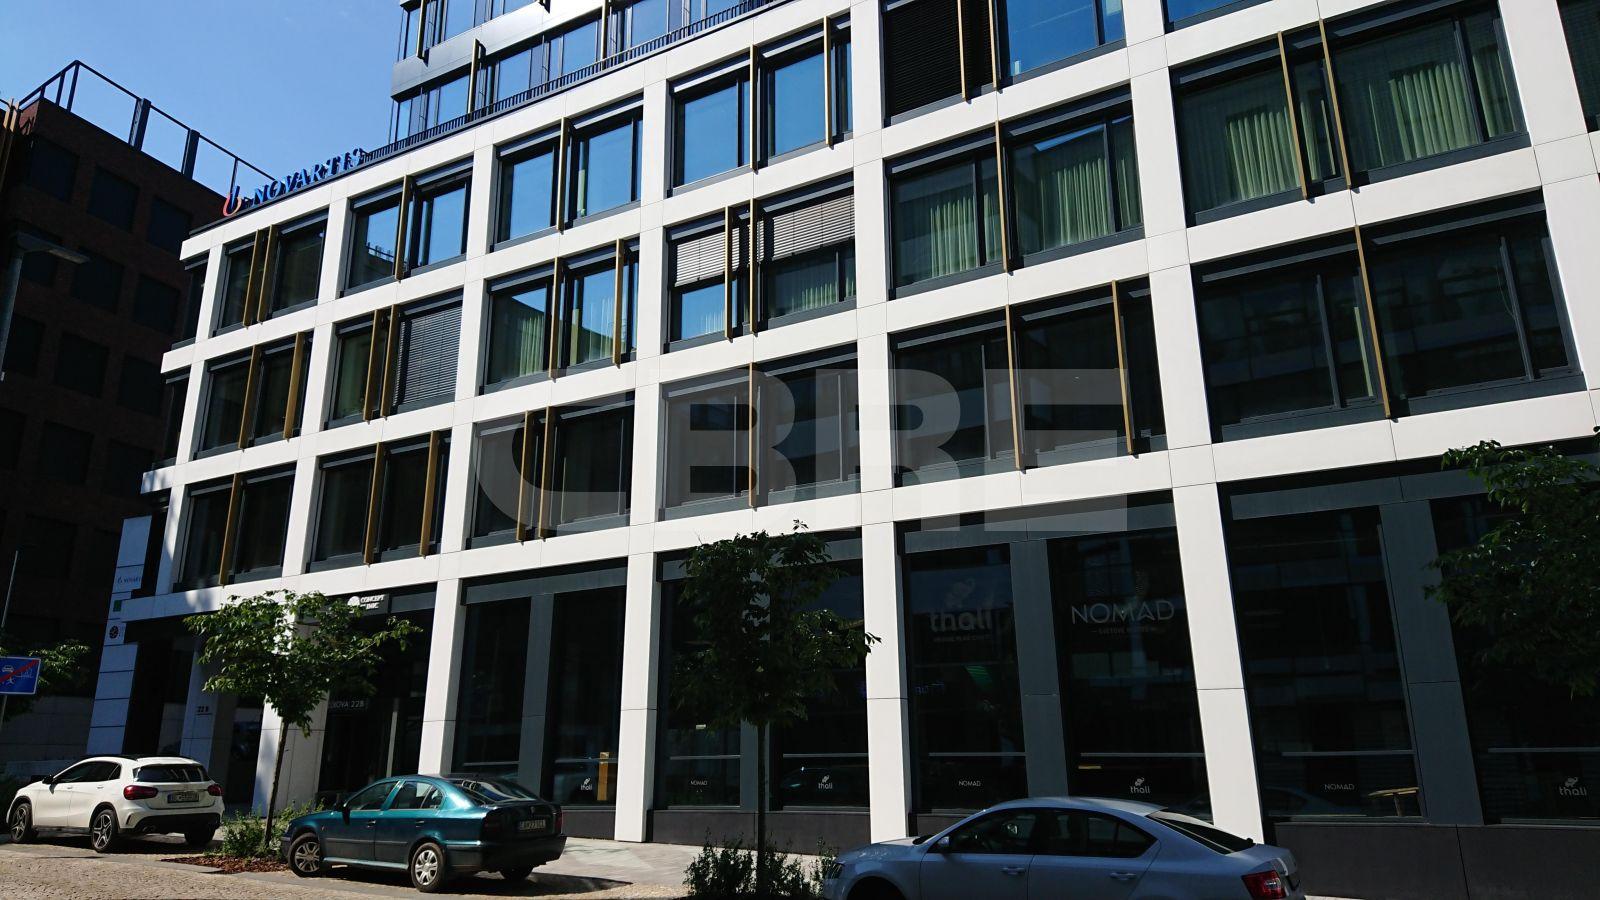 Zuckermandel - Hill Side, Bratislava - Staré Mesto | Offices for rent by CBRE | 1